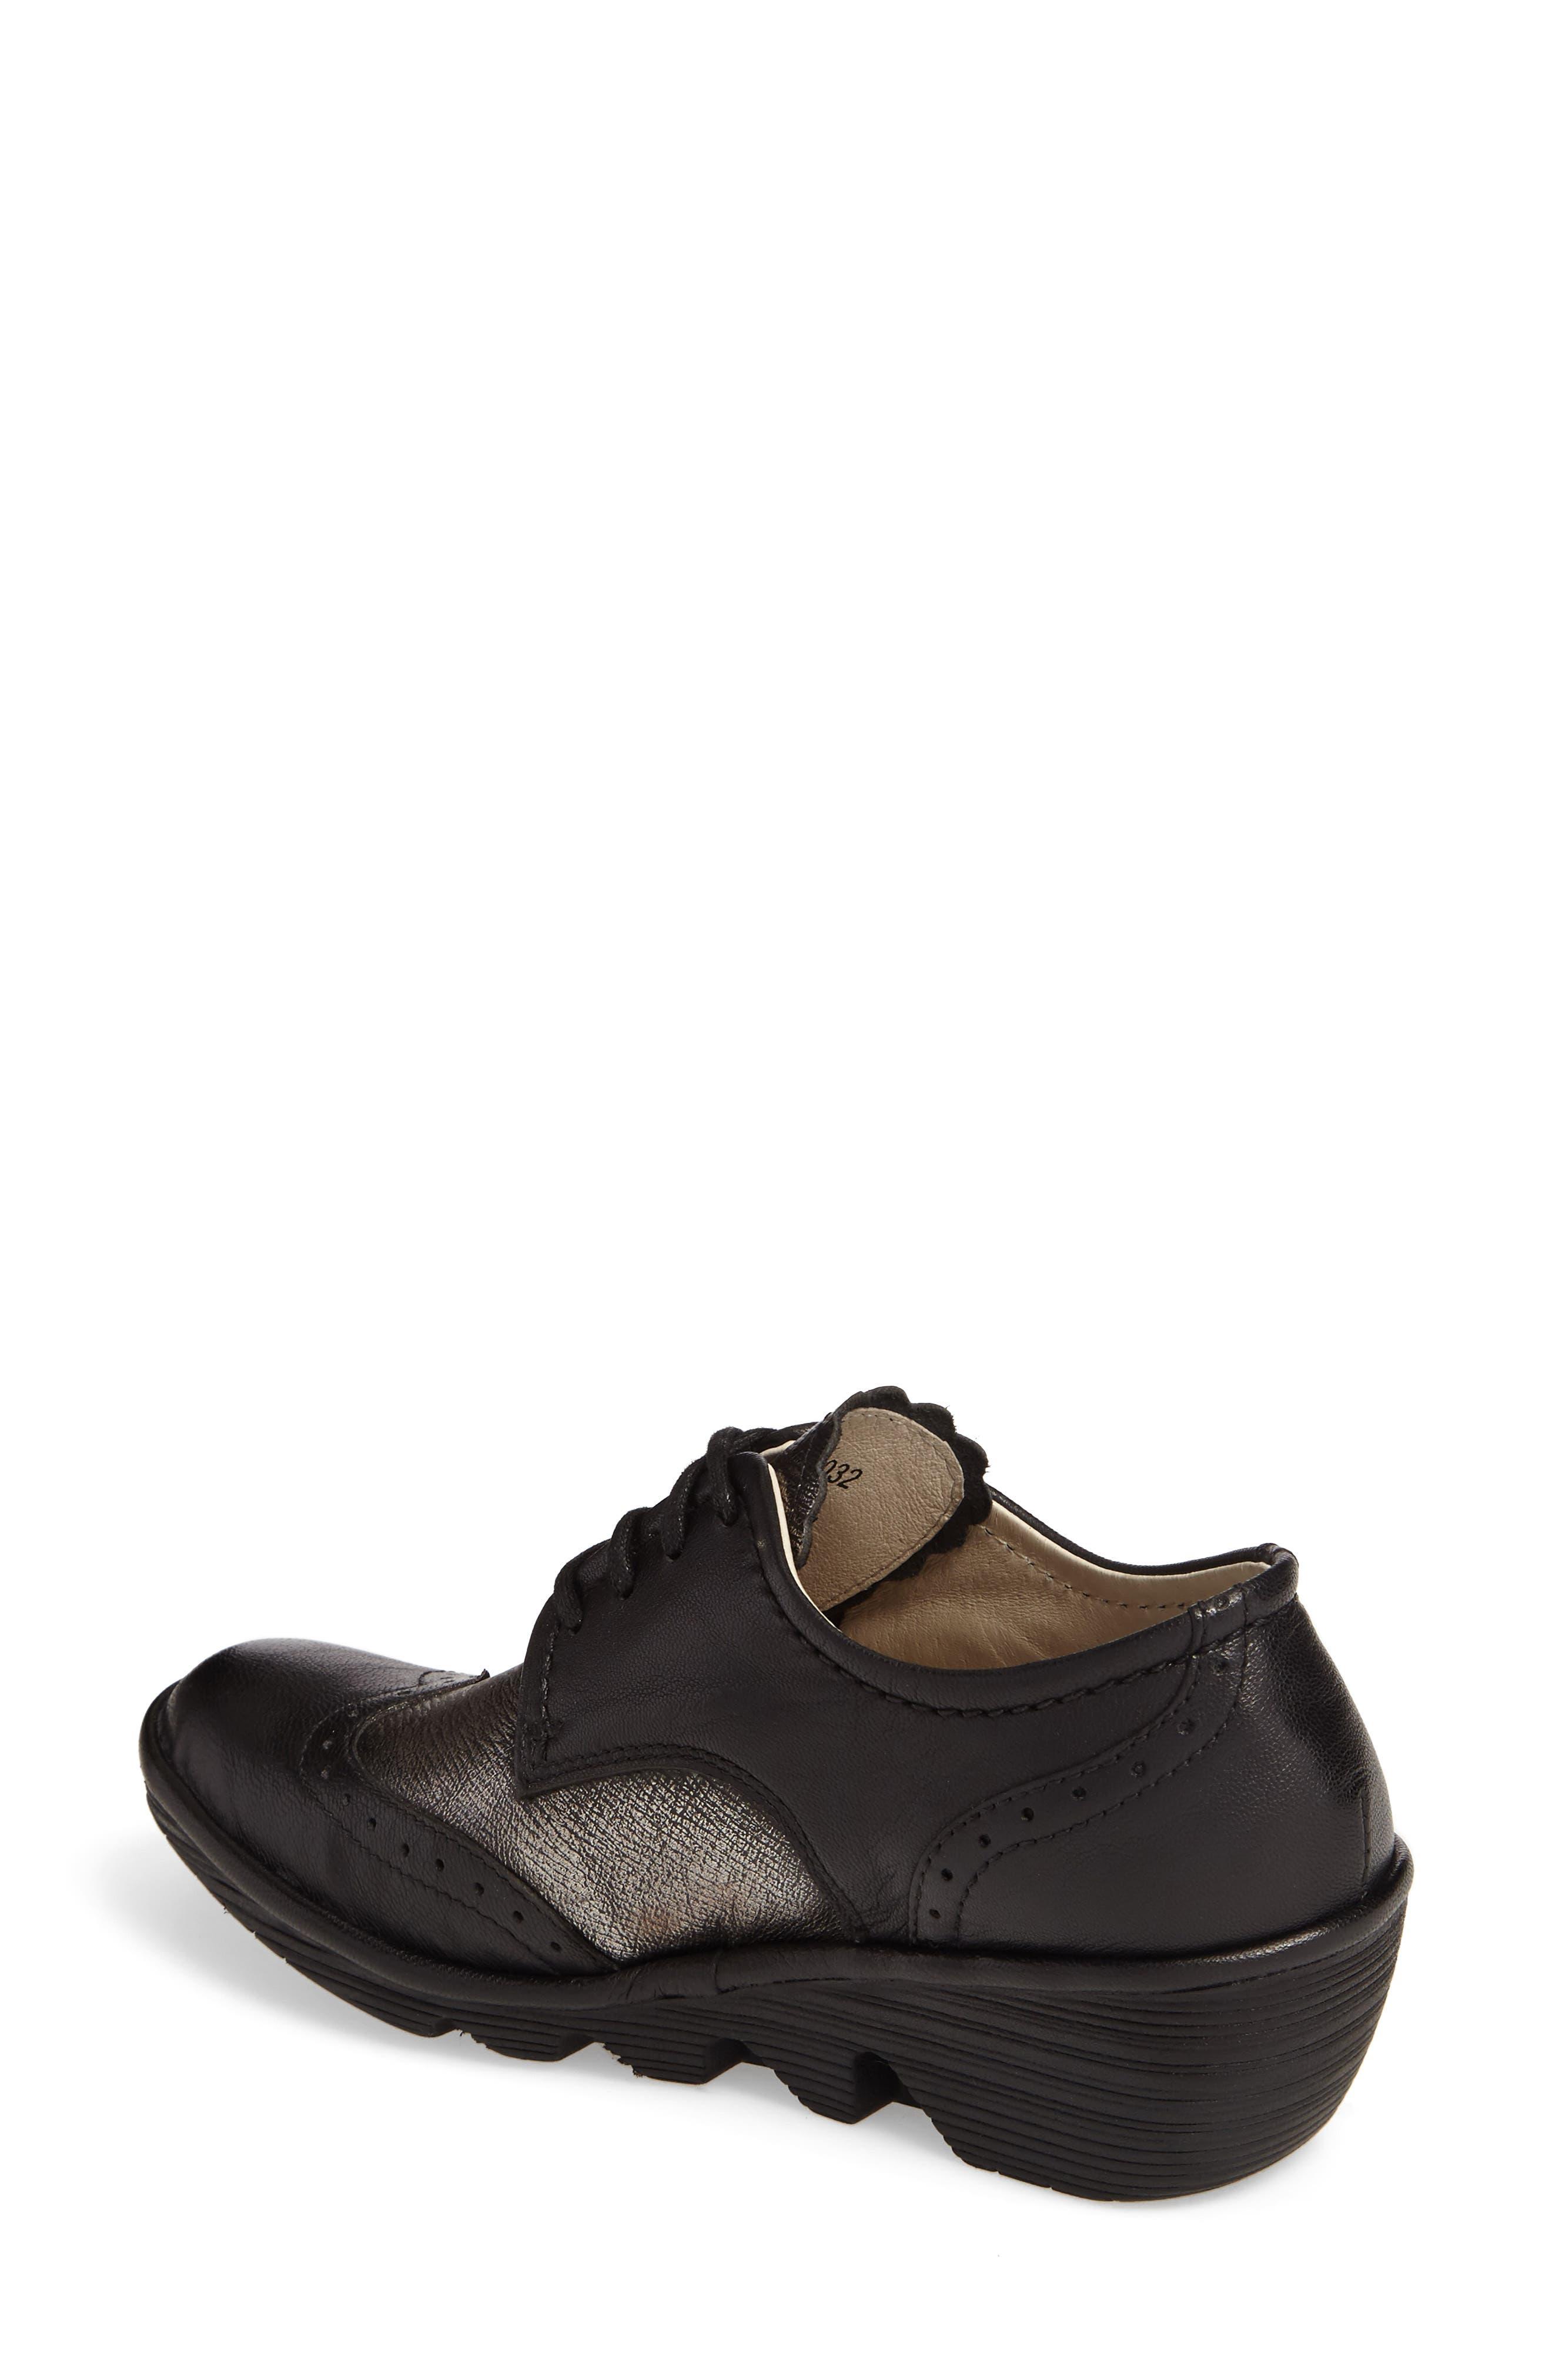 'Palt' WedgePump,                             Alternate thumbnail 2, color,                             Black/ Antique Silver Leather